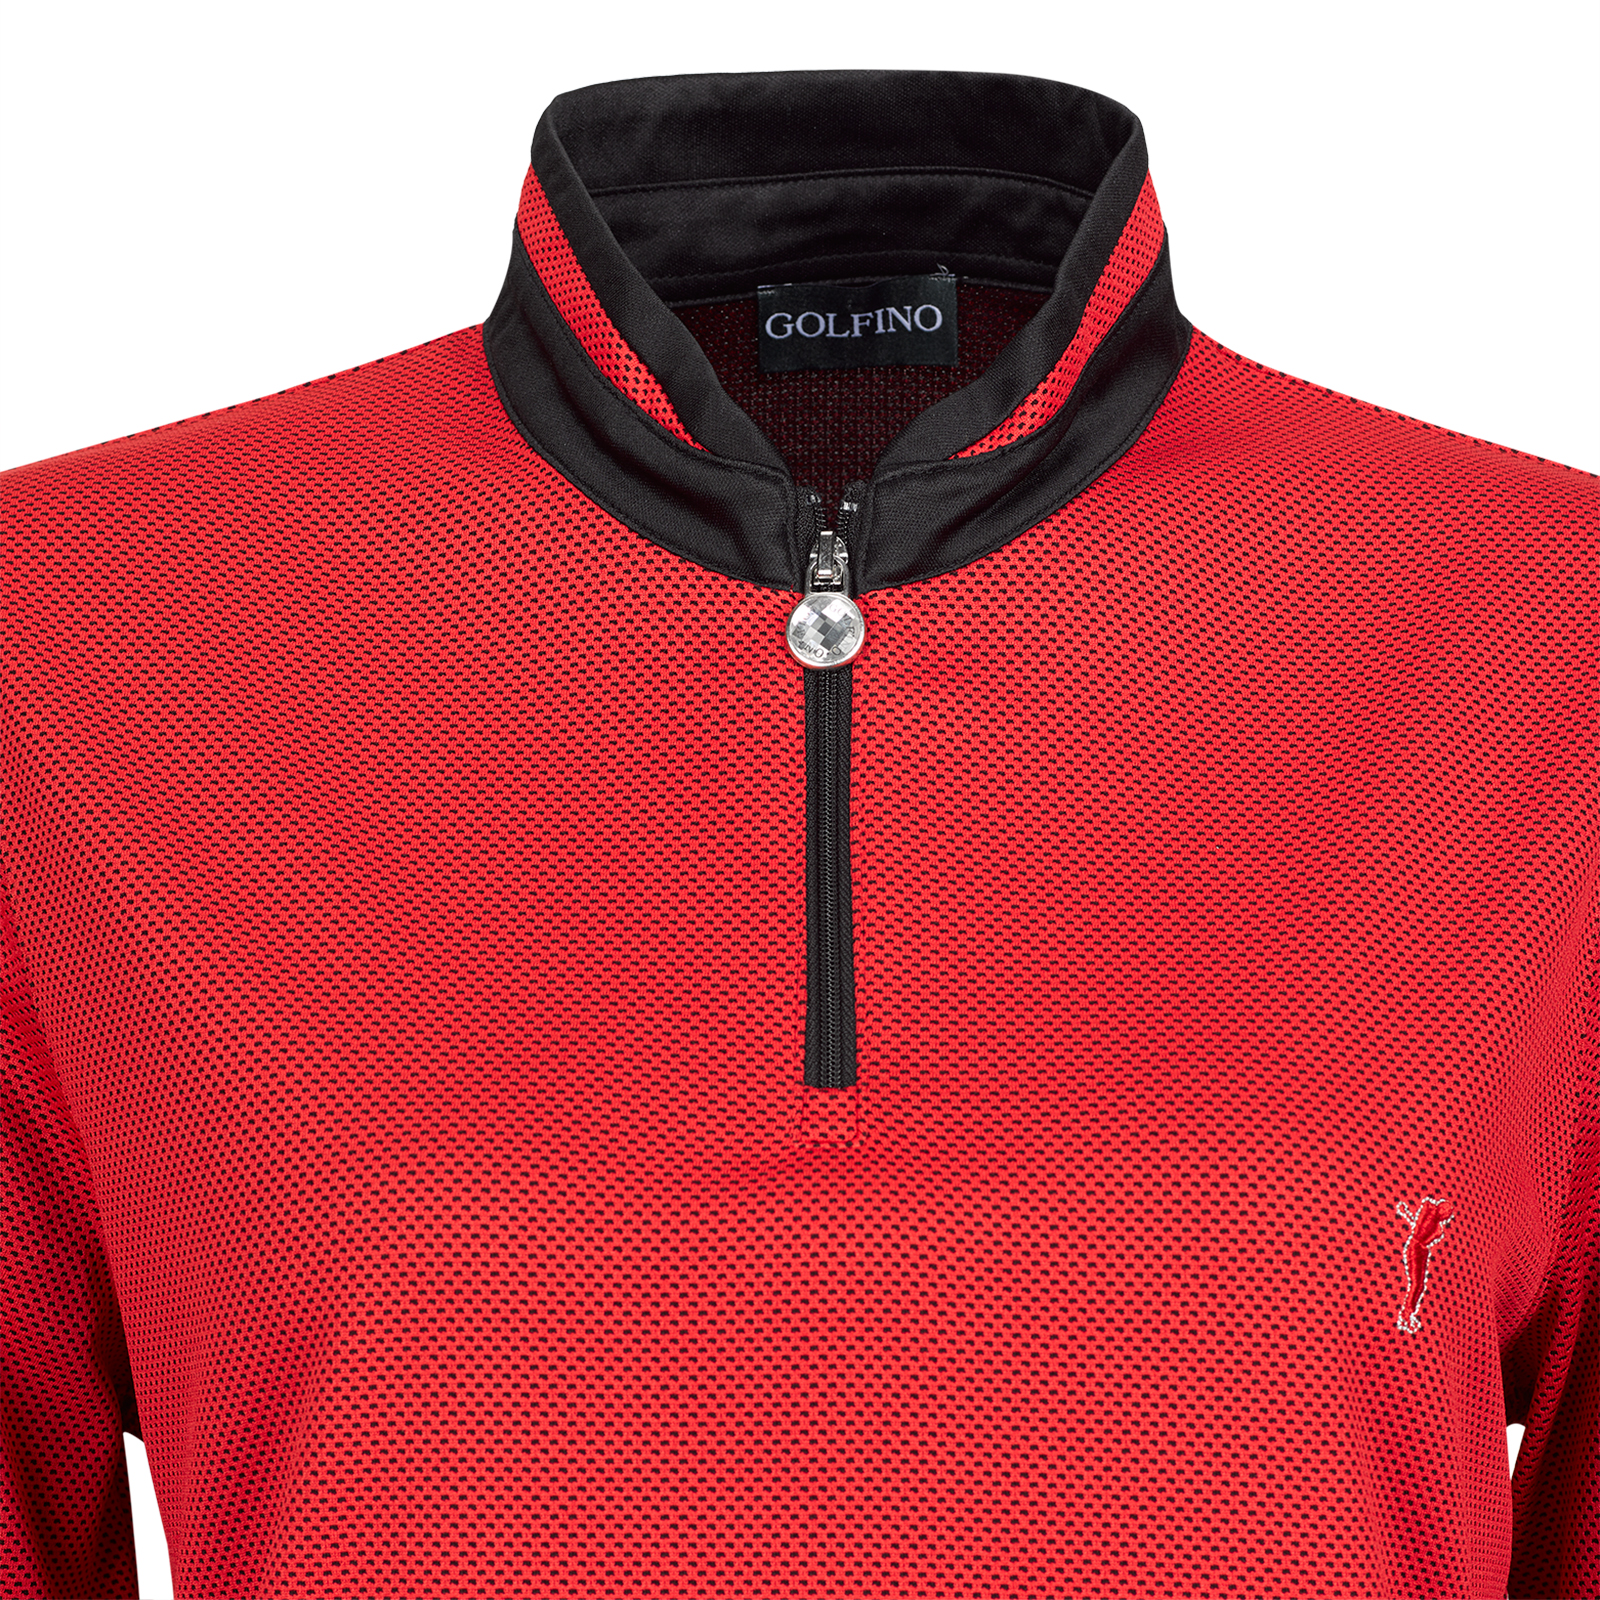 Bubble Jacquard Damen Langarm Funktions-Golfpolo Quick Dry